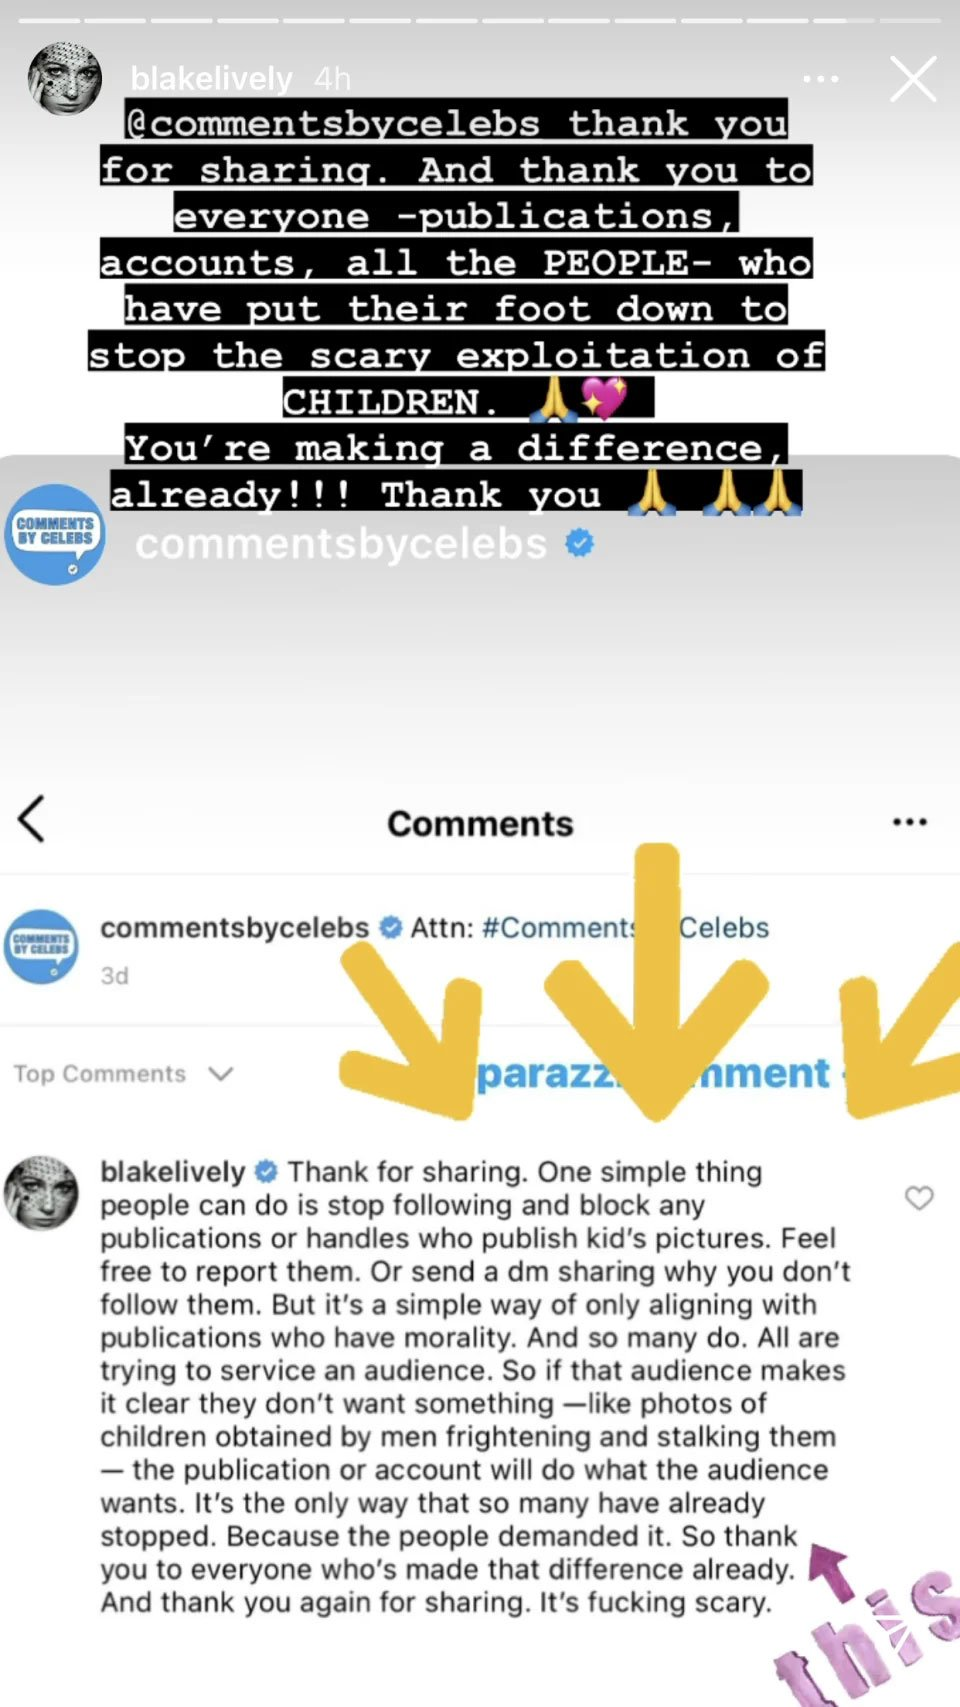 Blake Lively shares new note sharing paparazzi's threatening nature towards kids